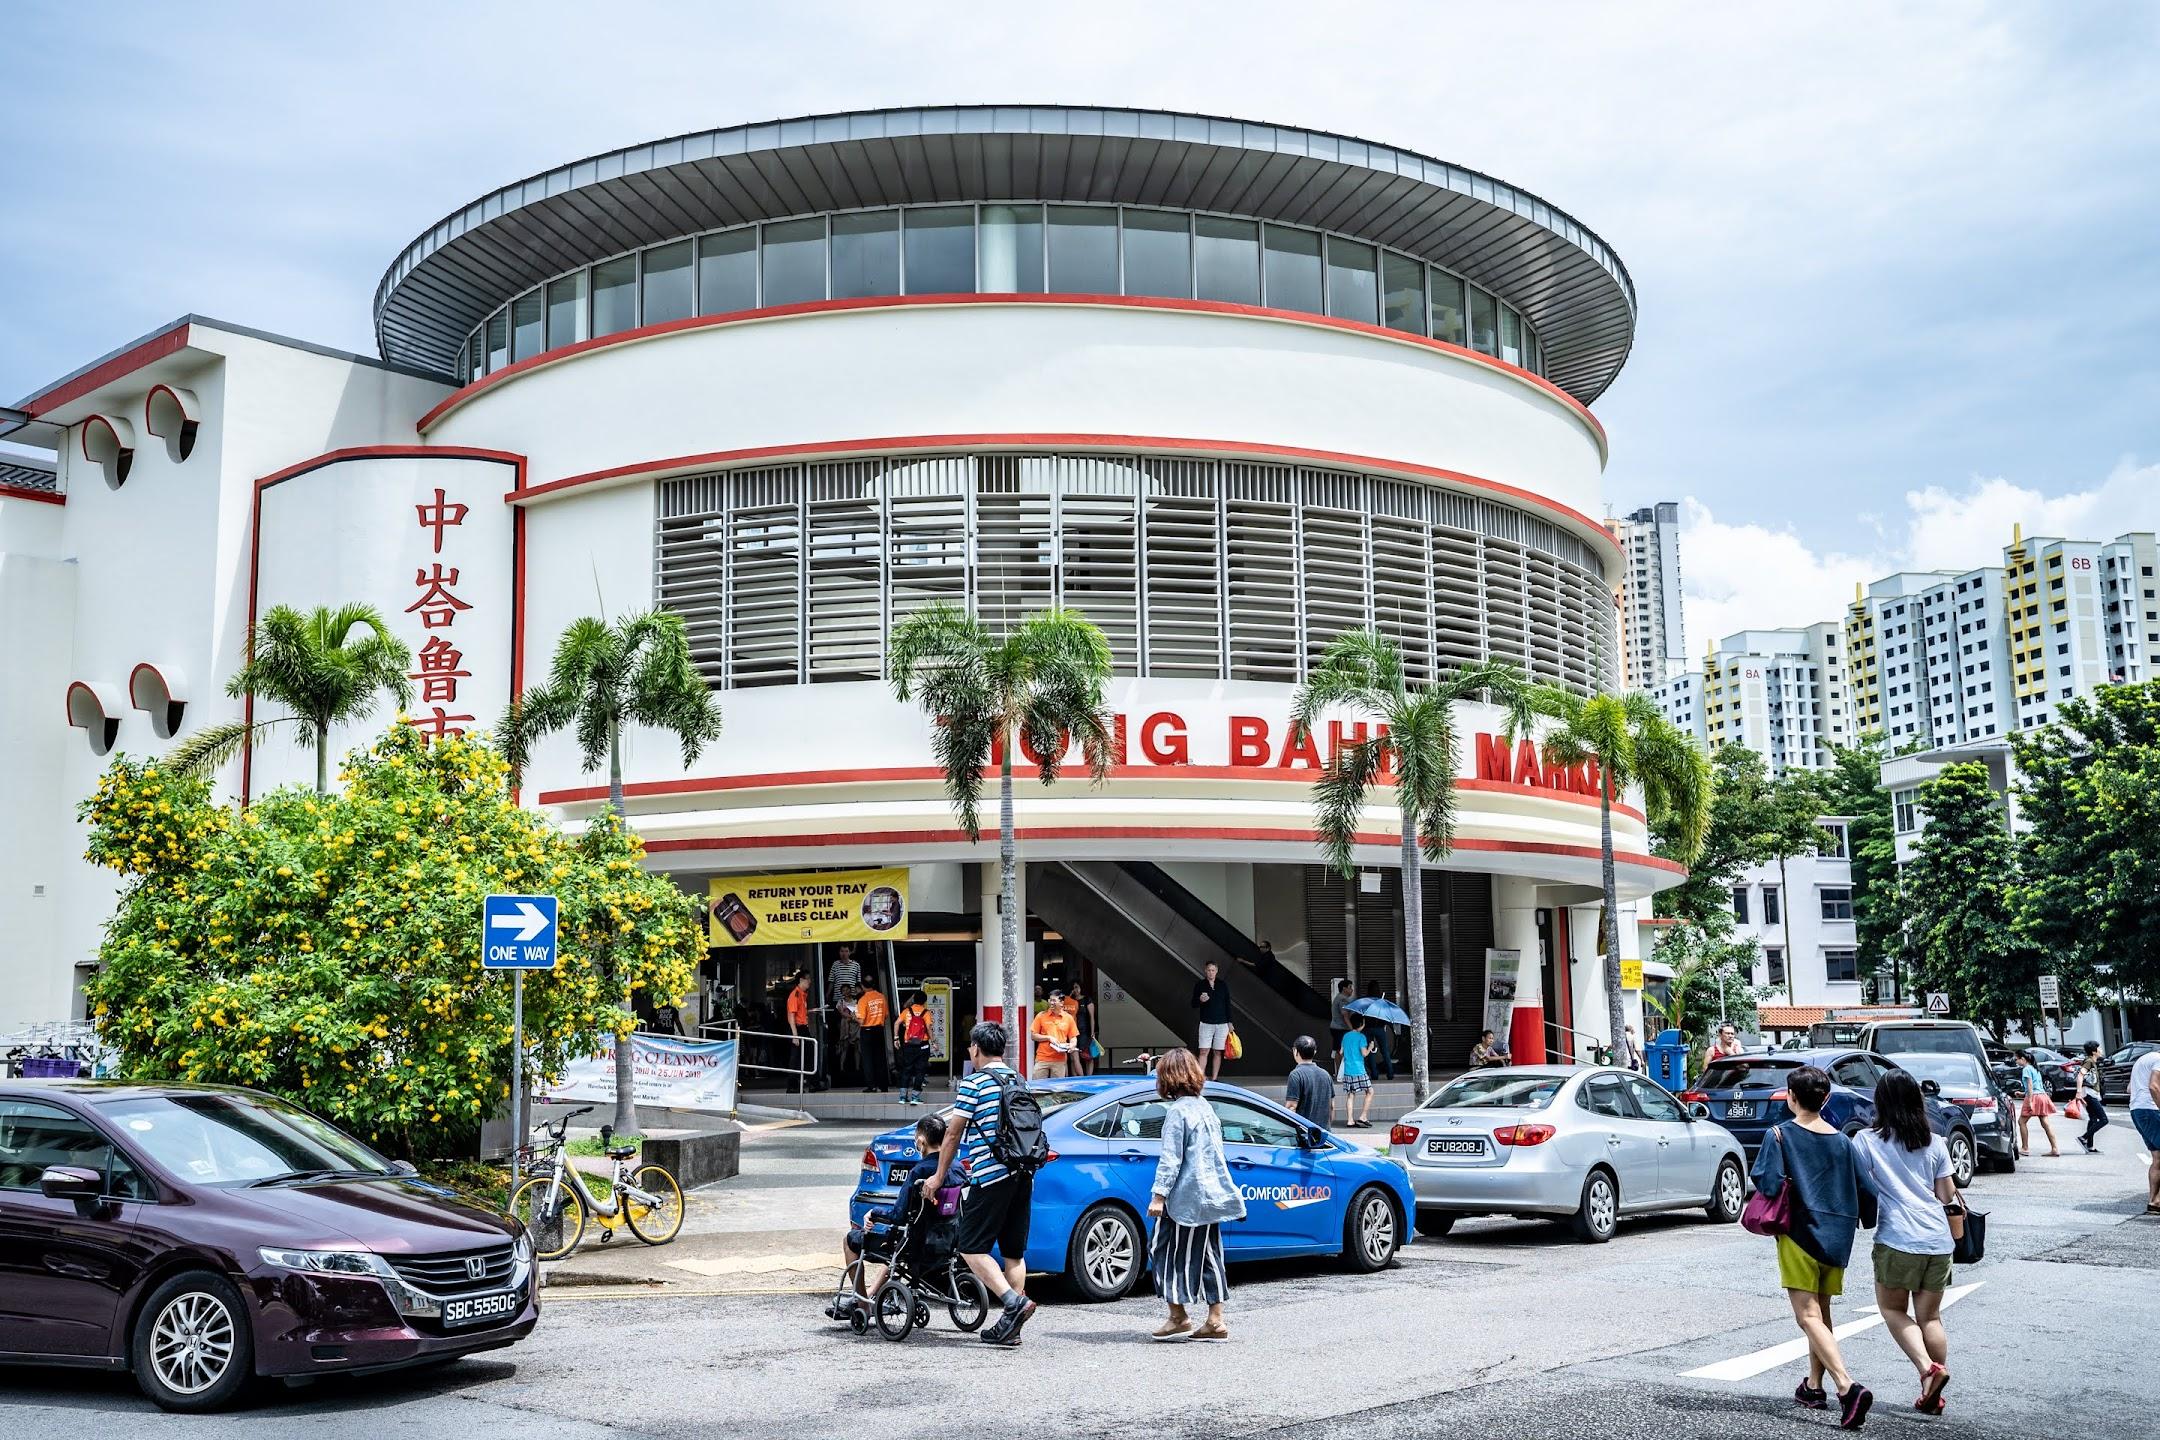 Singapore Tiong Bahru Market